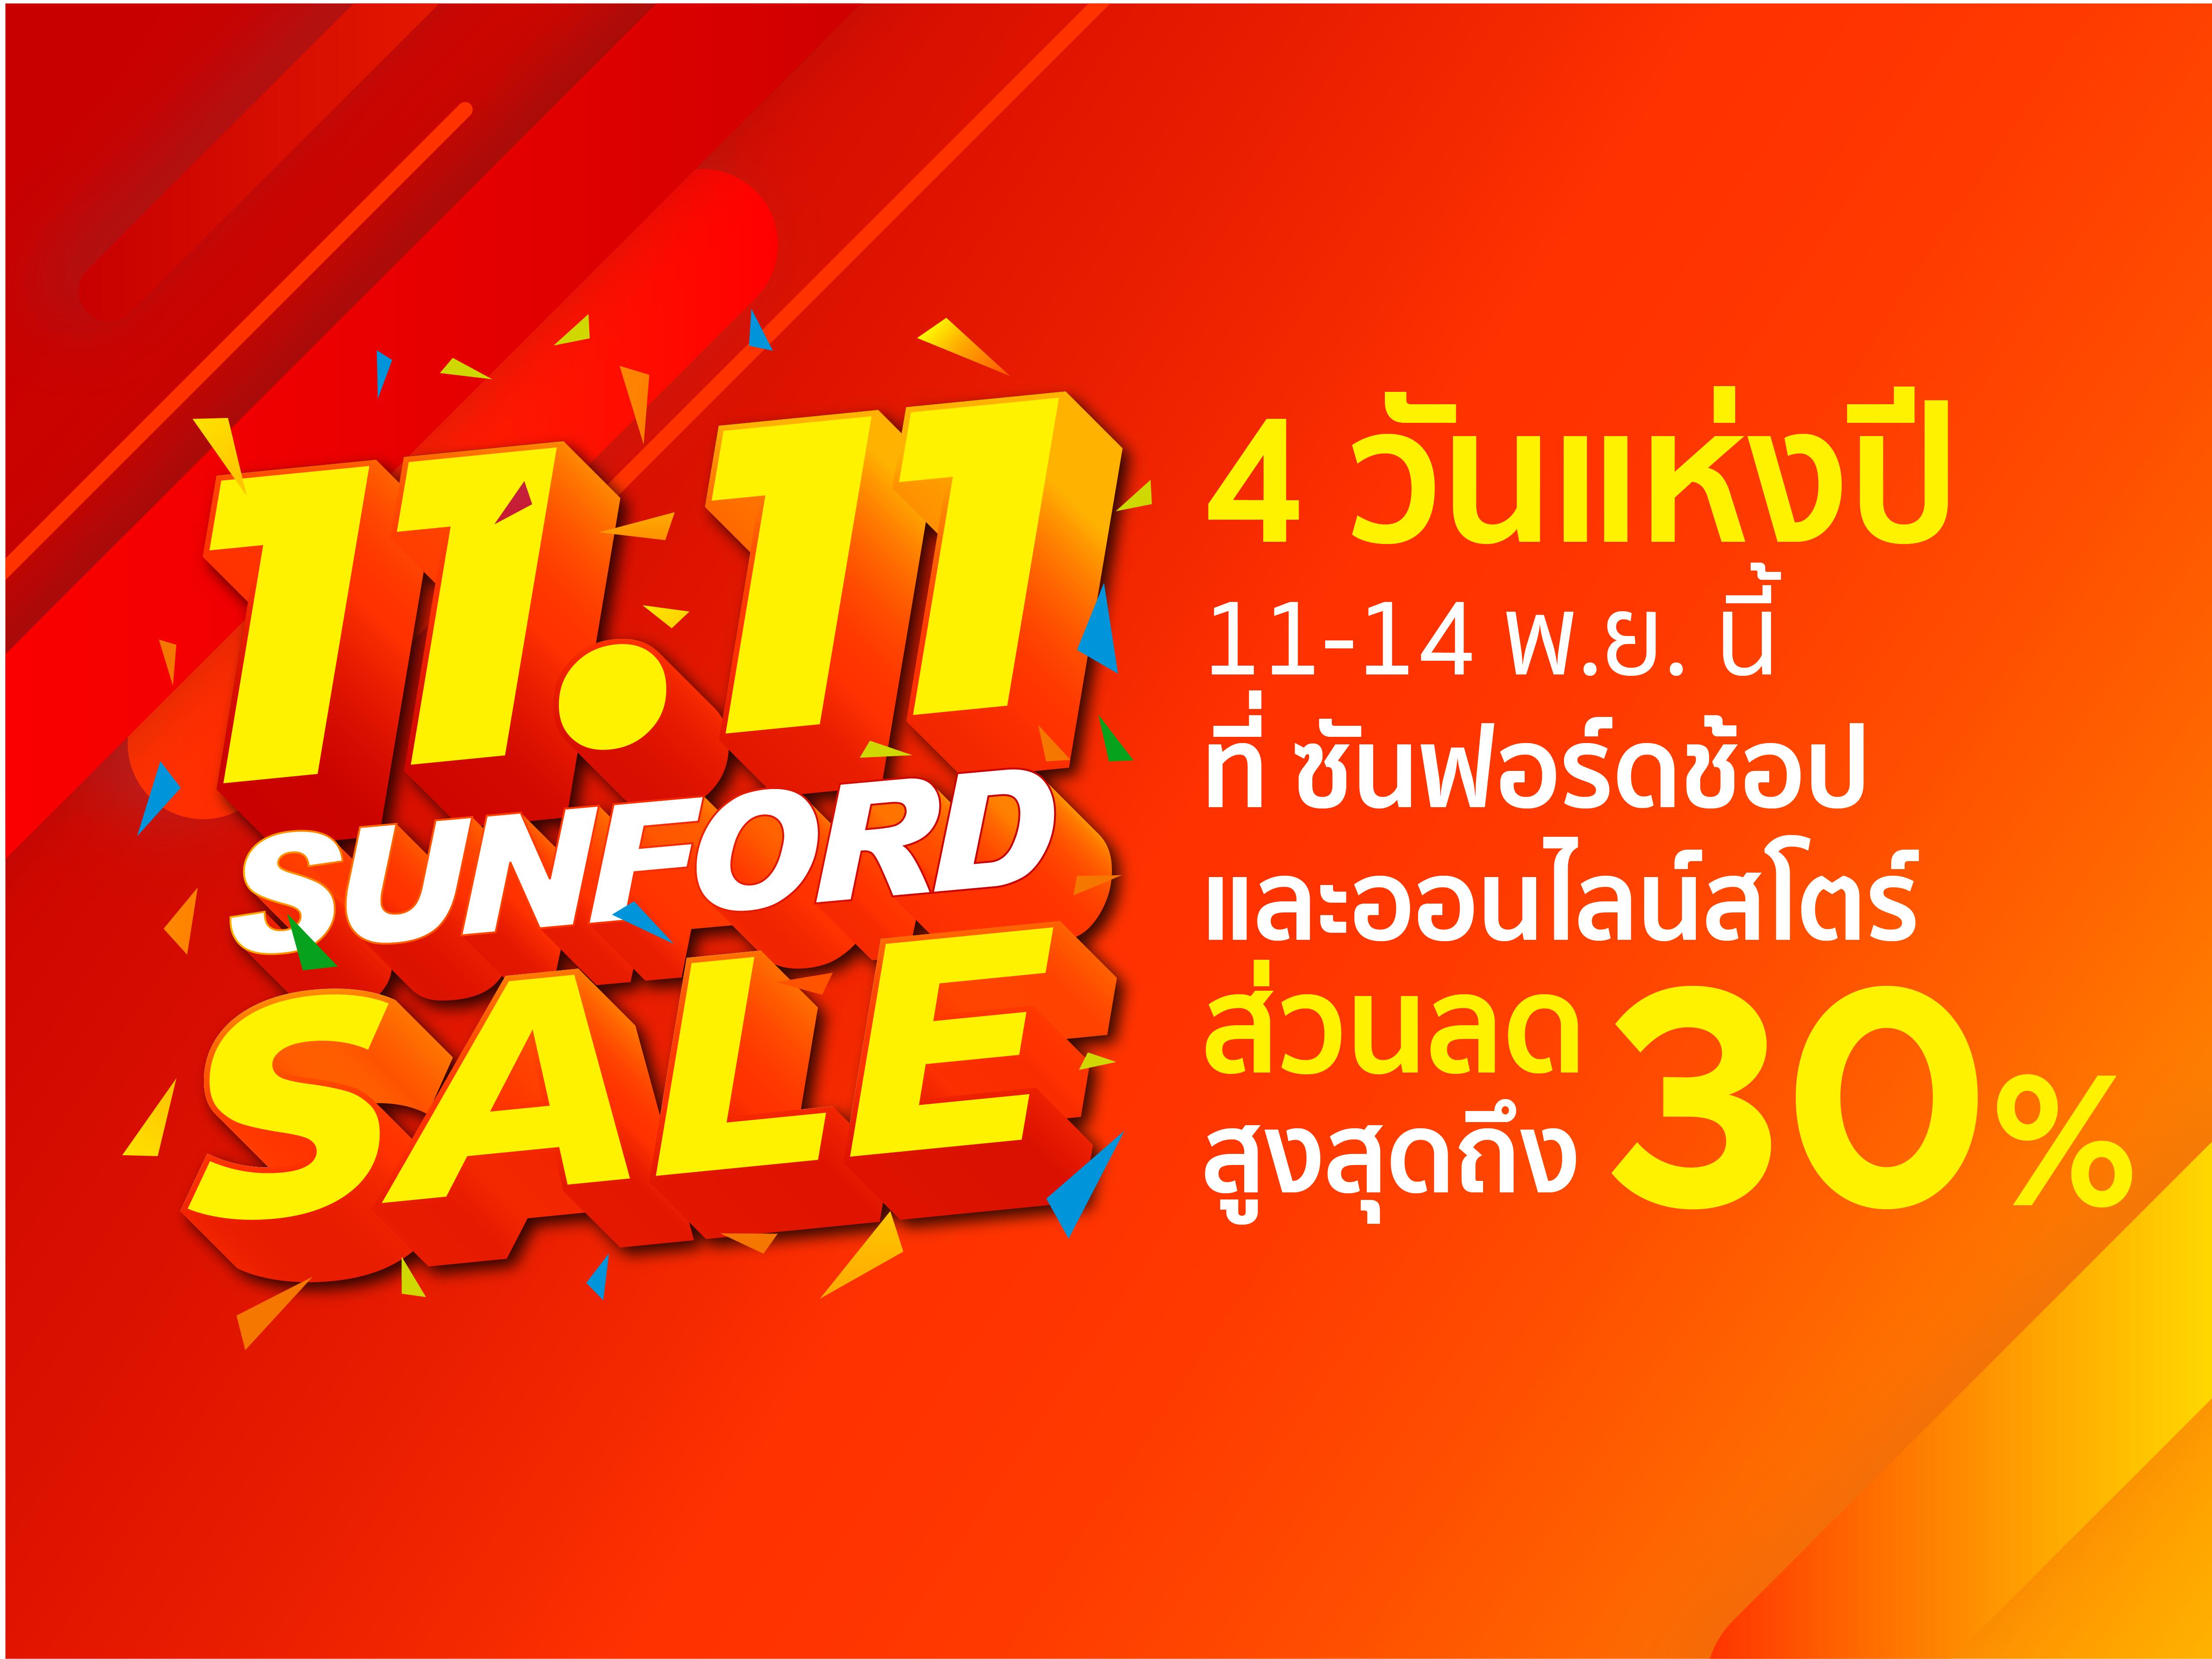 11.11.SUNFORD SALE!!